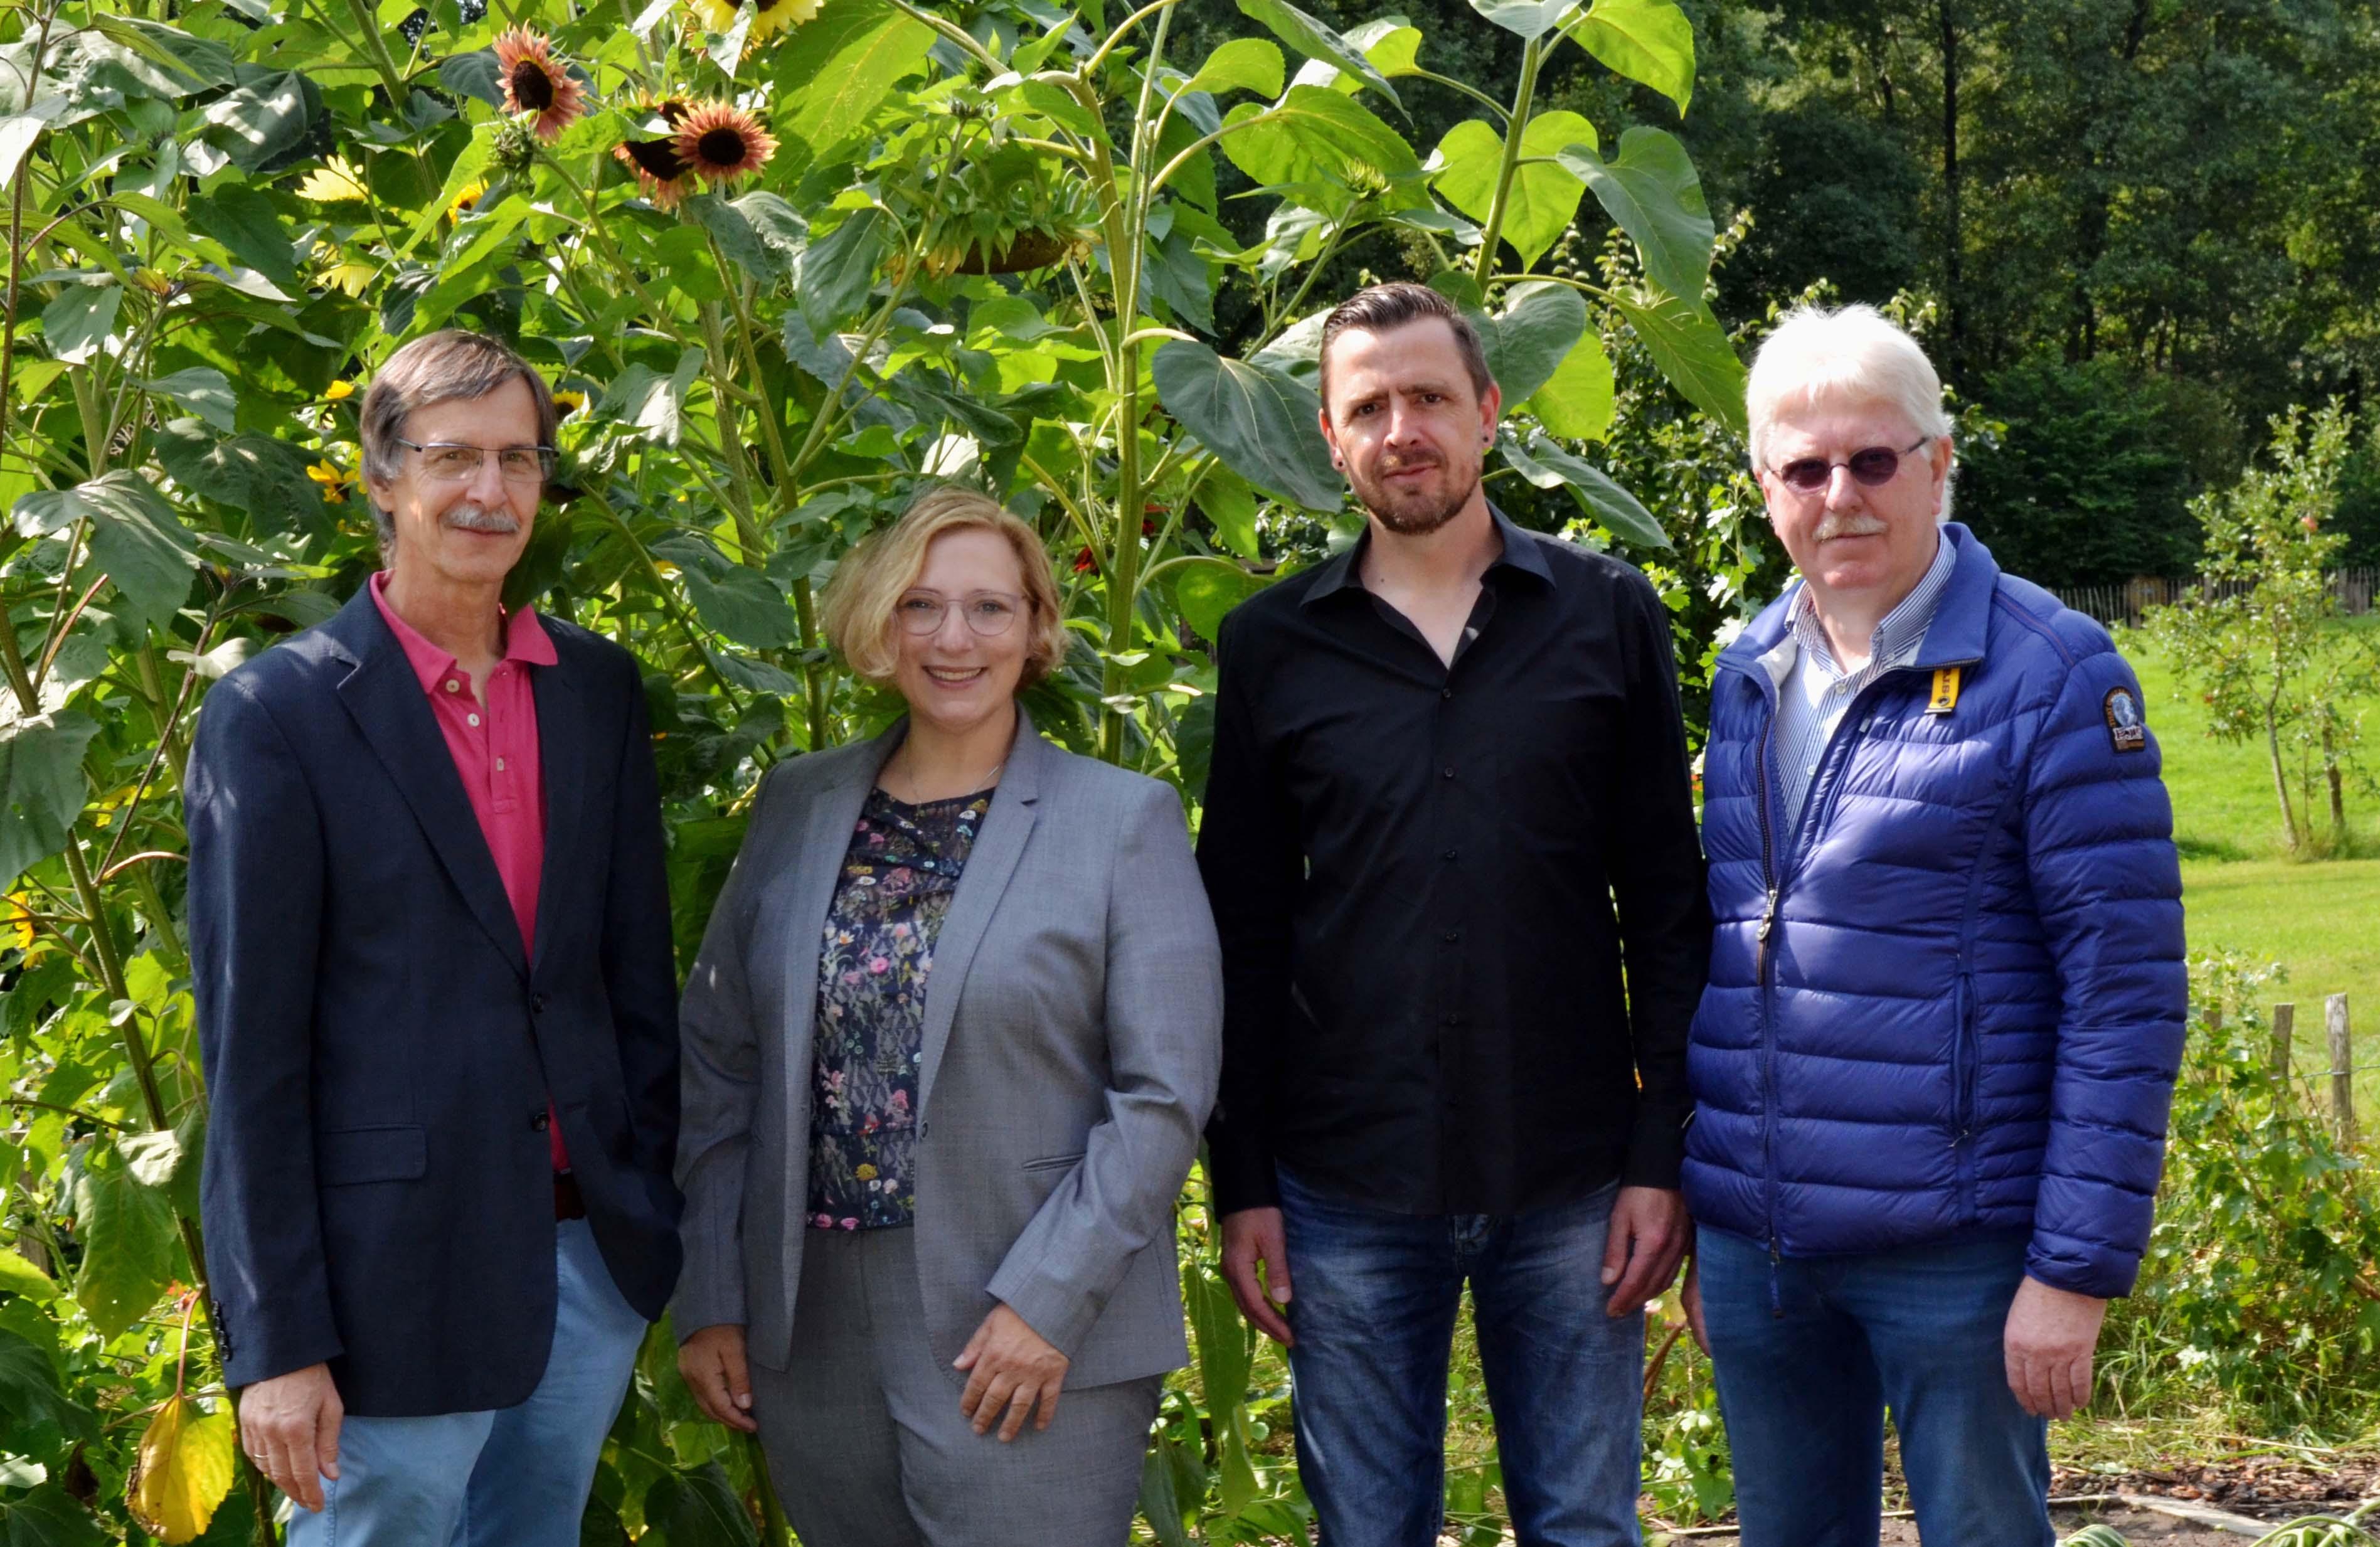 Besuch auf dem Hof Blecker. V. l. n. r.: Heinz Tanzer, Dr. Daniela De Ridder, Frank Wilken und Johann Schepers